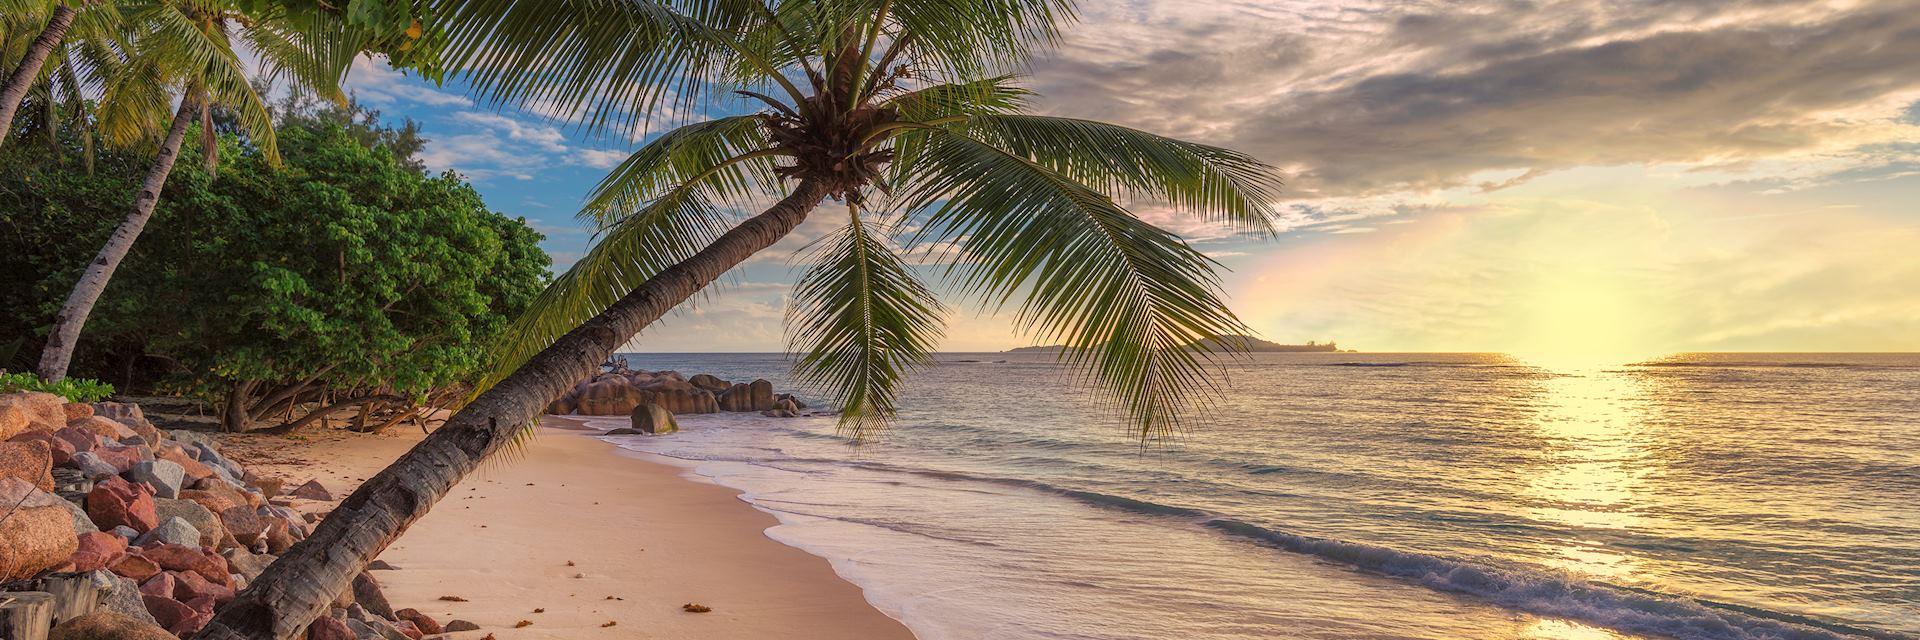 Beach in Jamaica, Caribbean